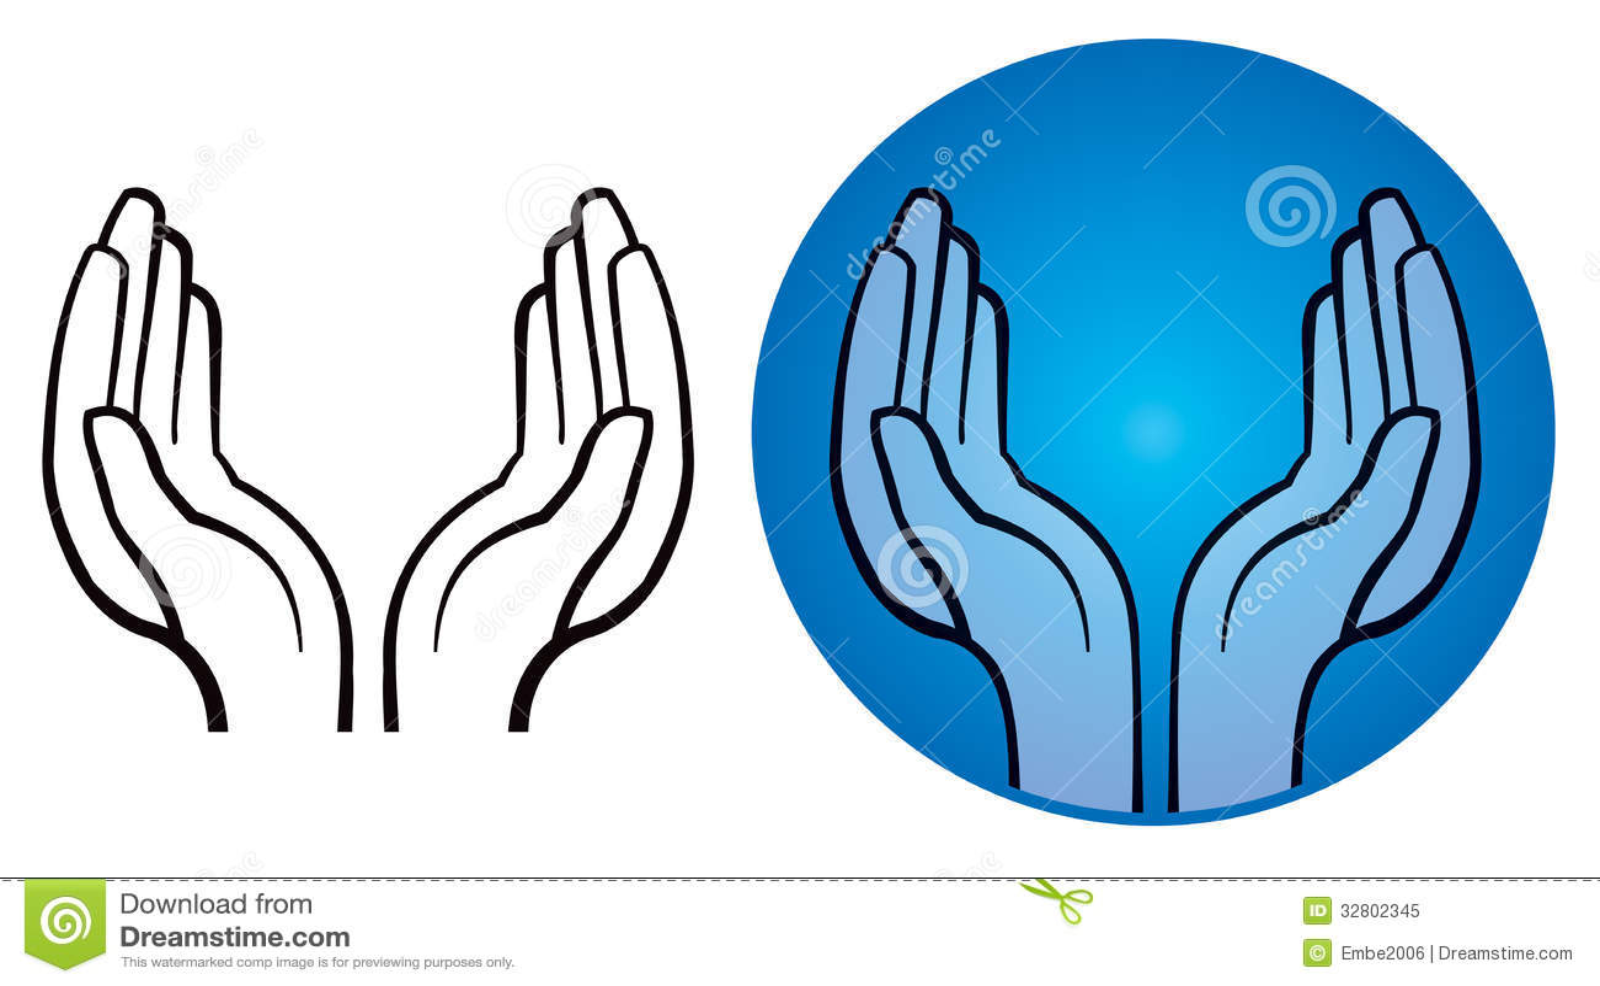 Open Hands Logo Stock Vector Illustration Of Human Finger 32802345